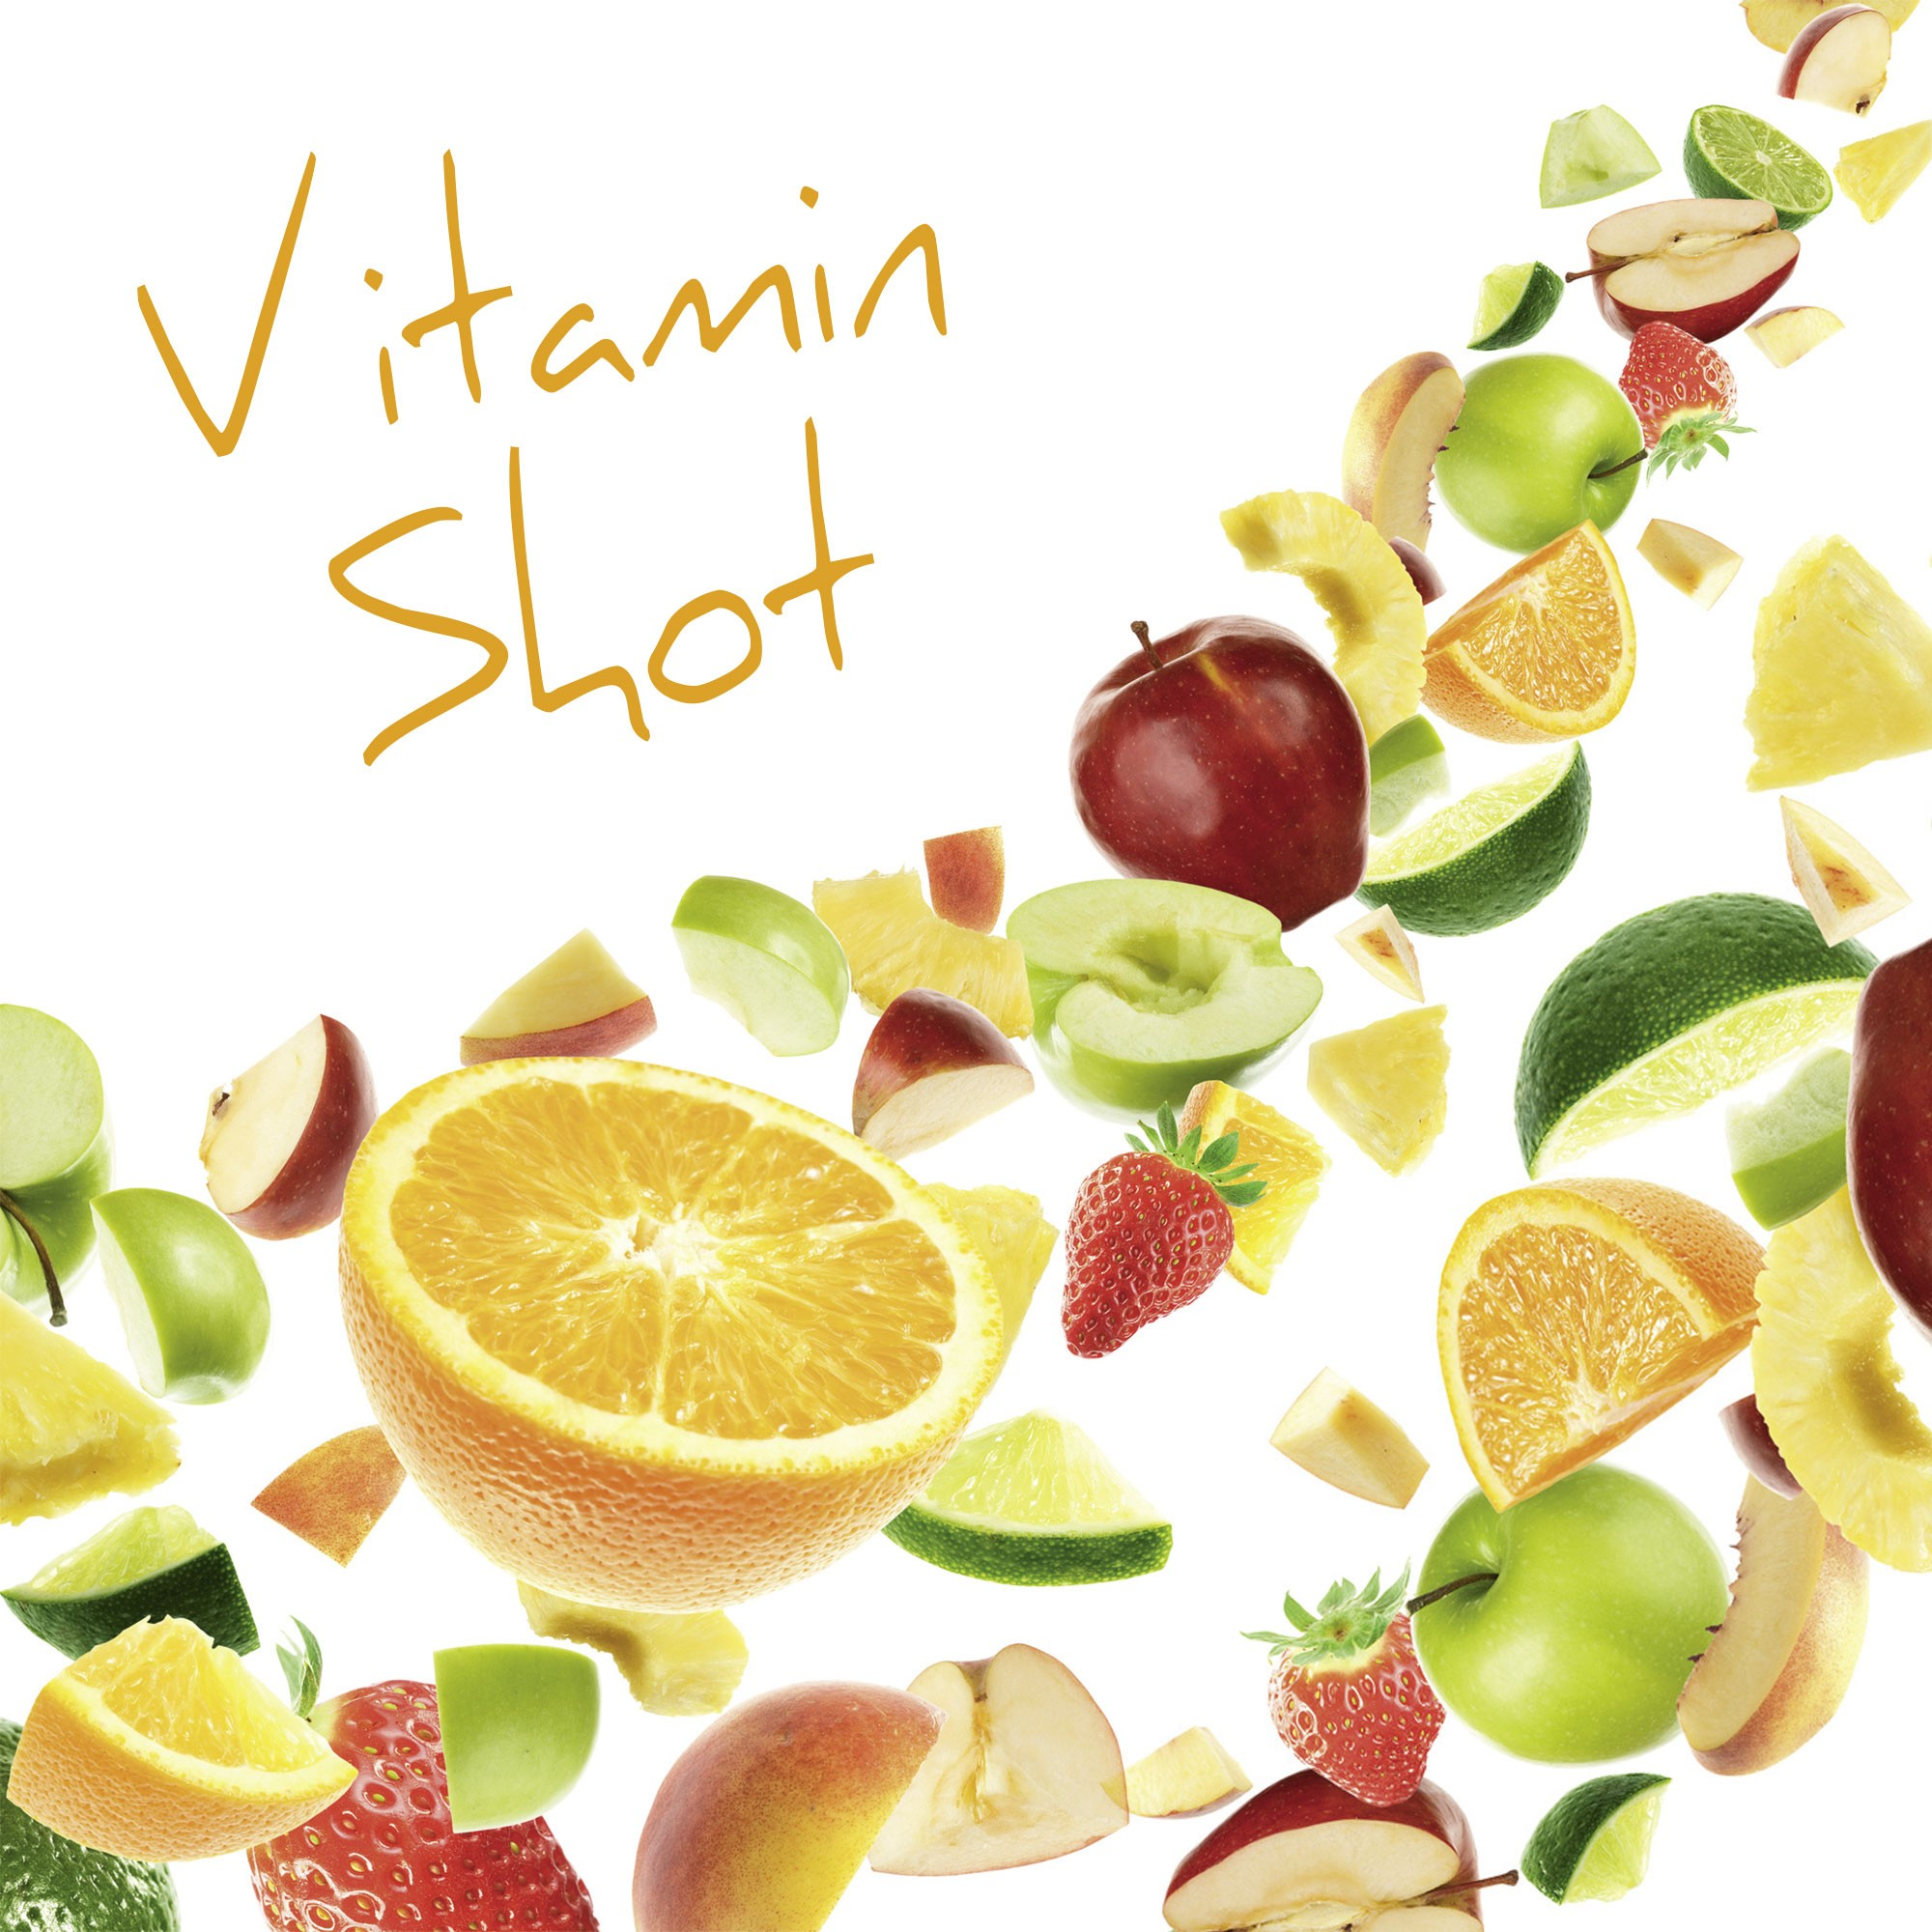 vitamin shot 60 ml fullbody made in germany 1529 392. Black Bedroom Furniture Sets. Home Design Ideas